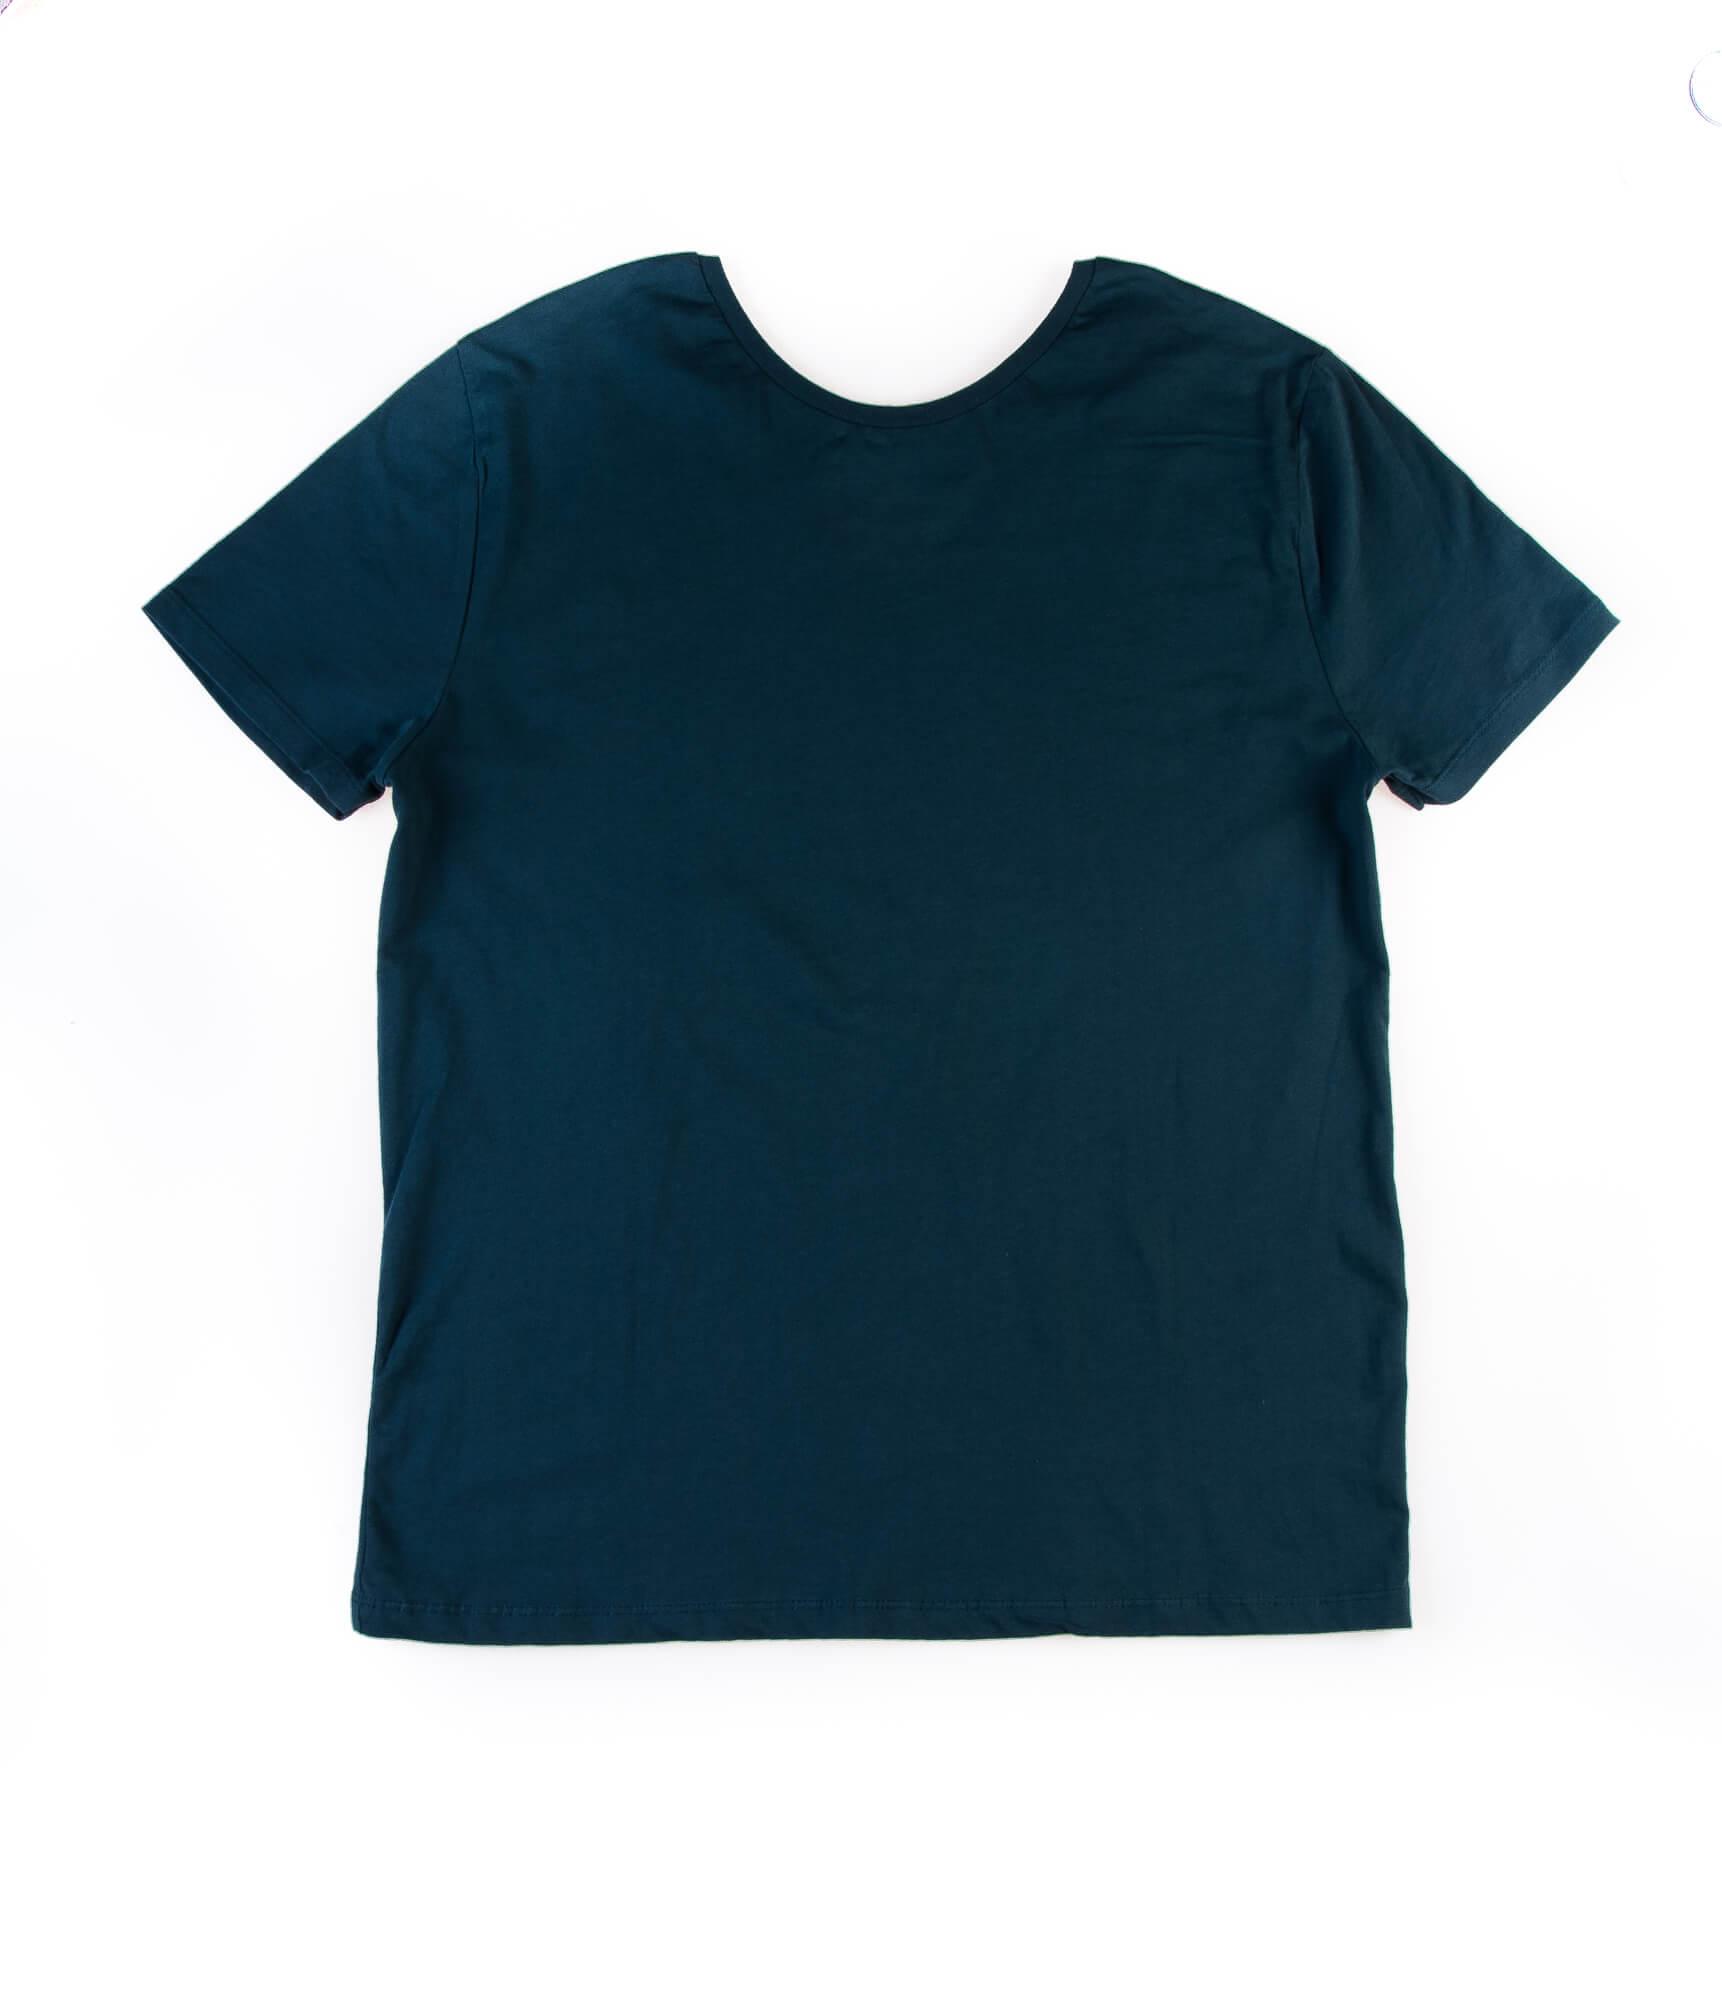 تی شرت مردانه برند OUT DOOR LIFT کد S1009